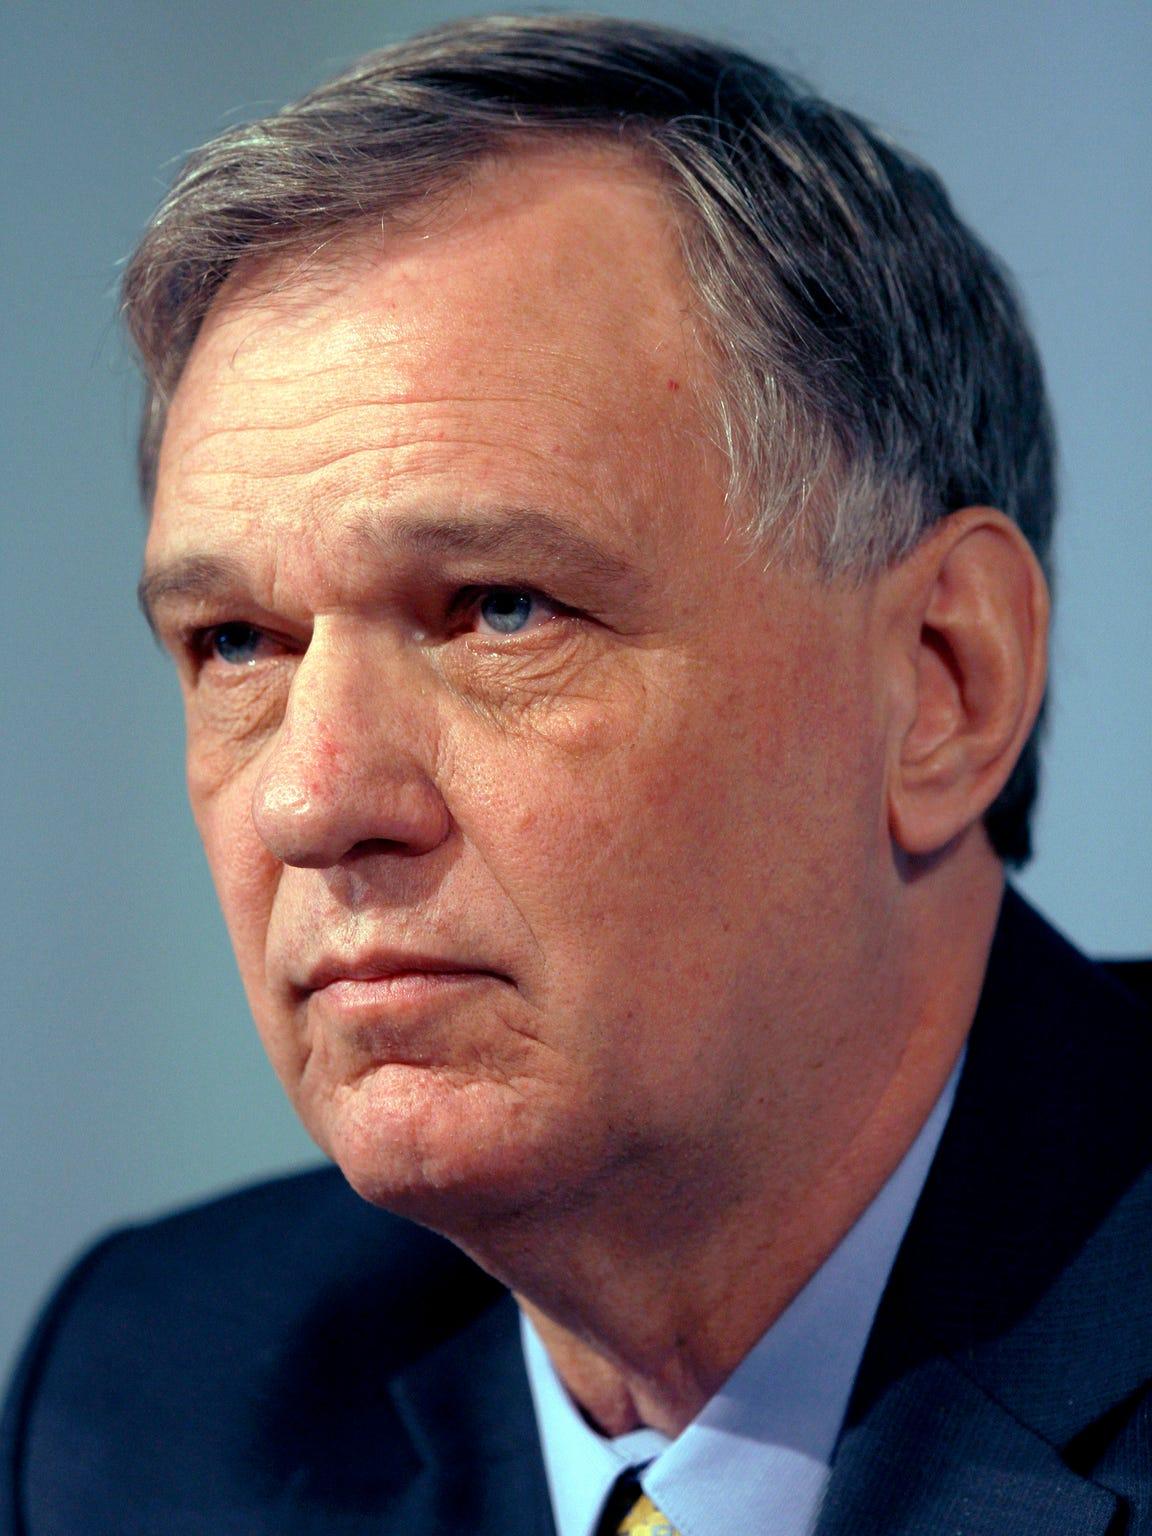 John Hanger was the DEP Secretary under Gov. Edward